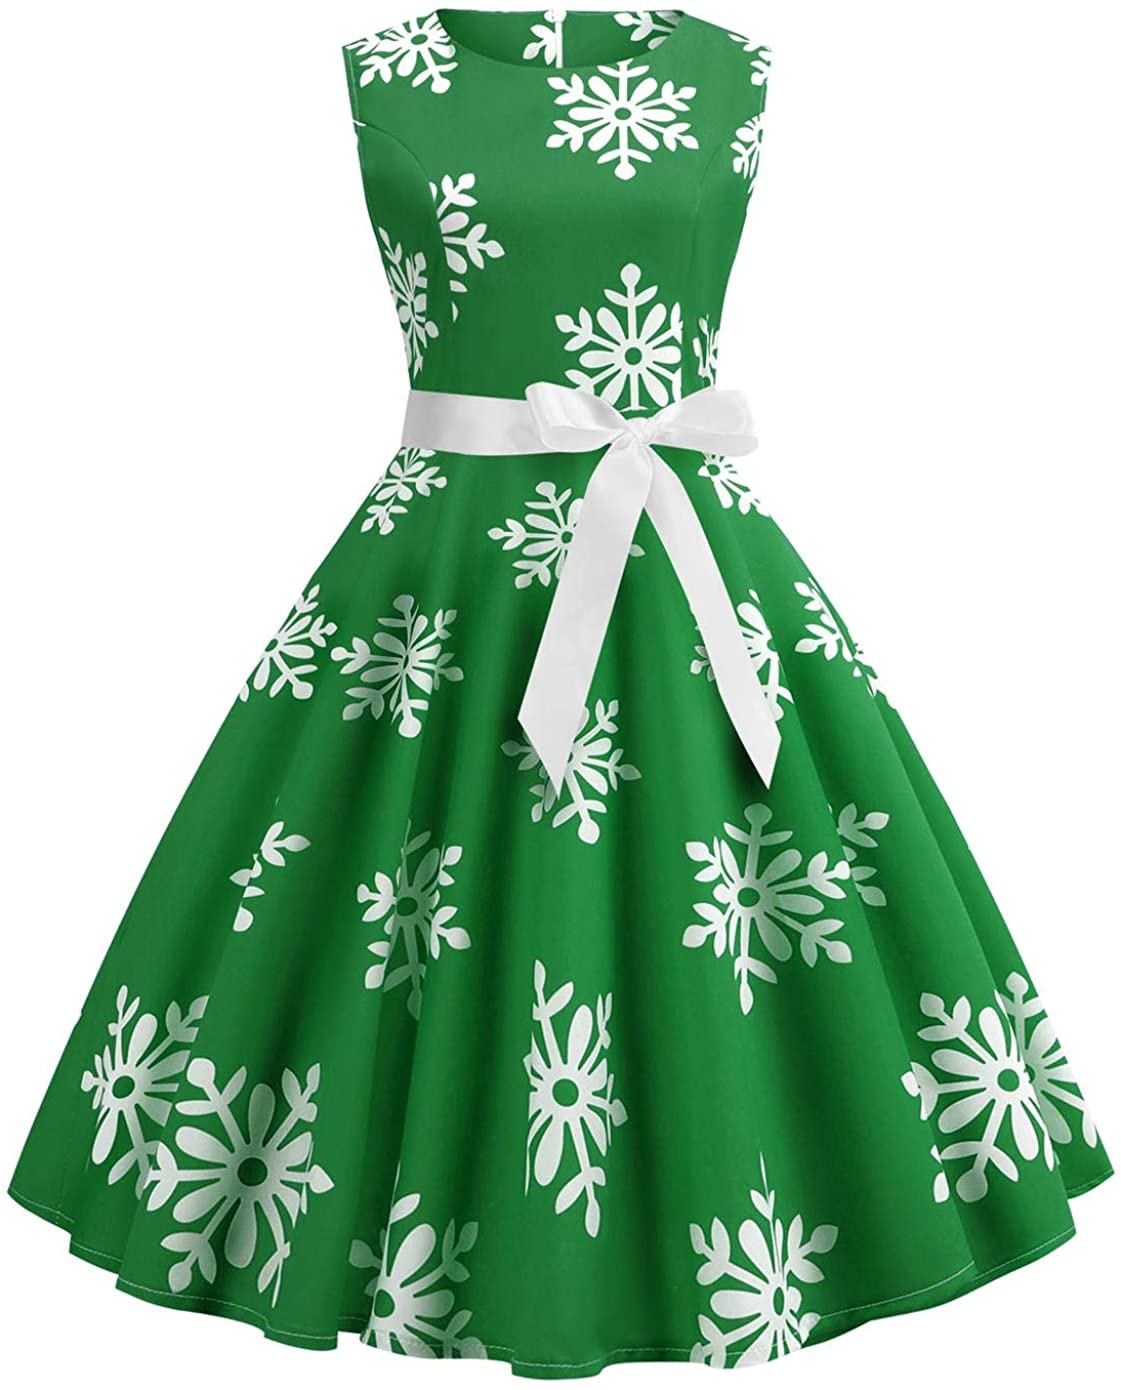 Women's Audrey Hepburn Rockabilly Vintage Dress 1950s Retro Cocktail Swing Party Dress